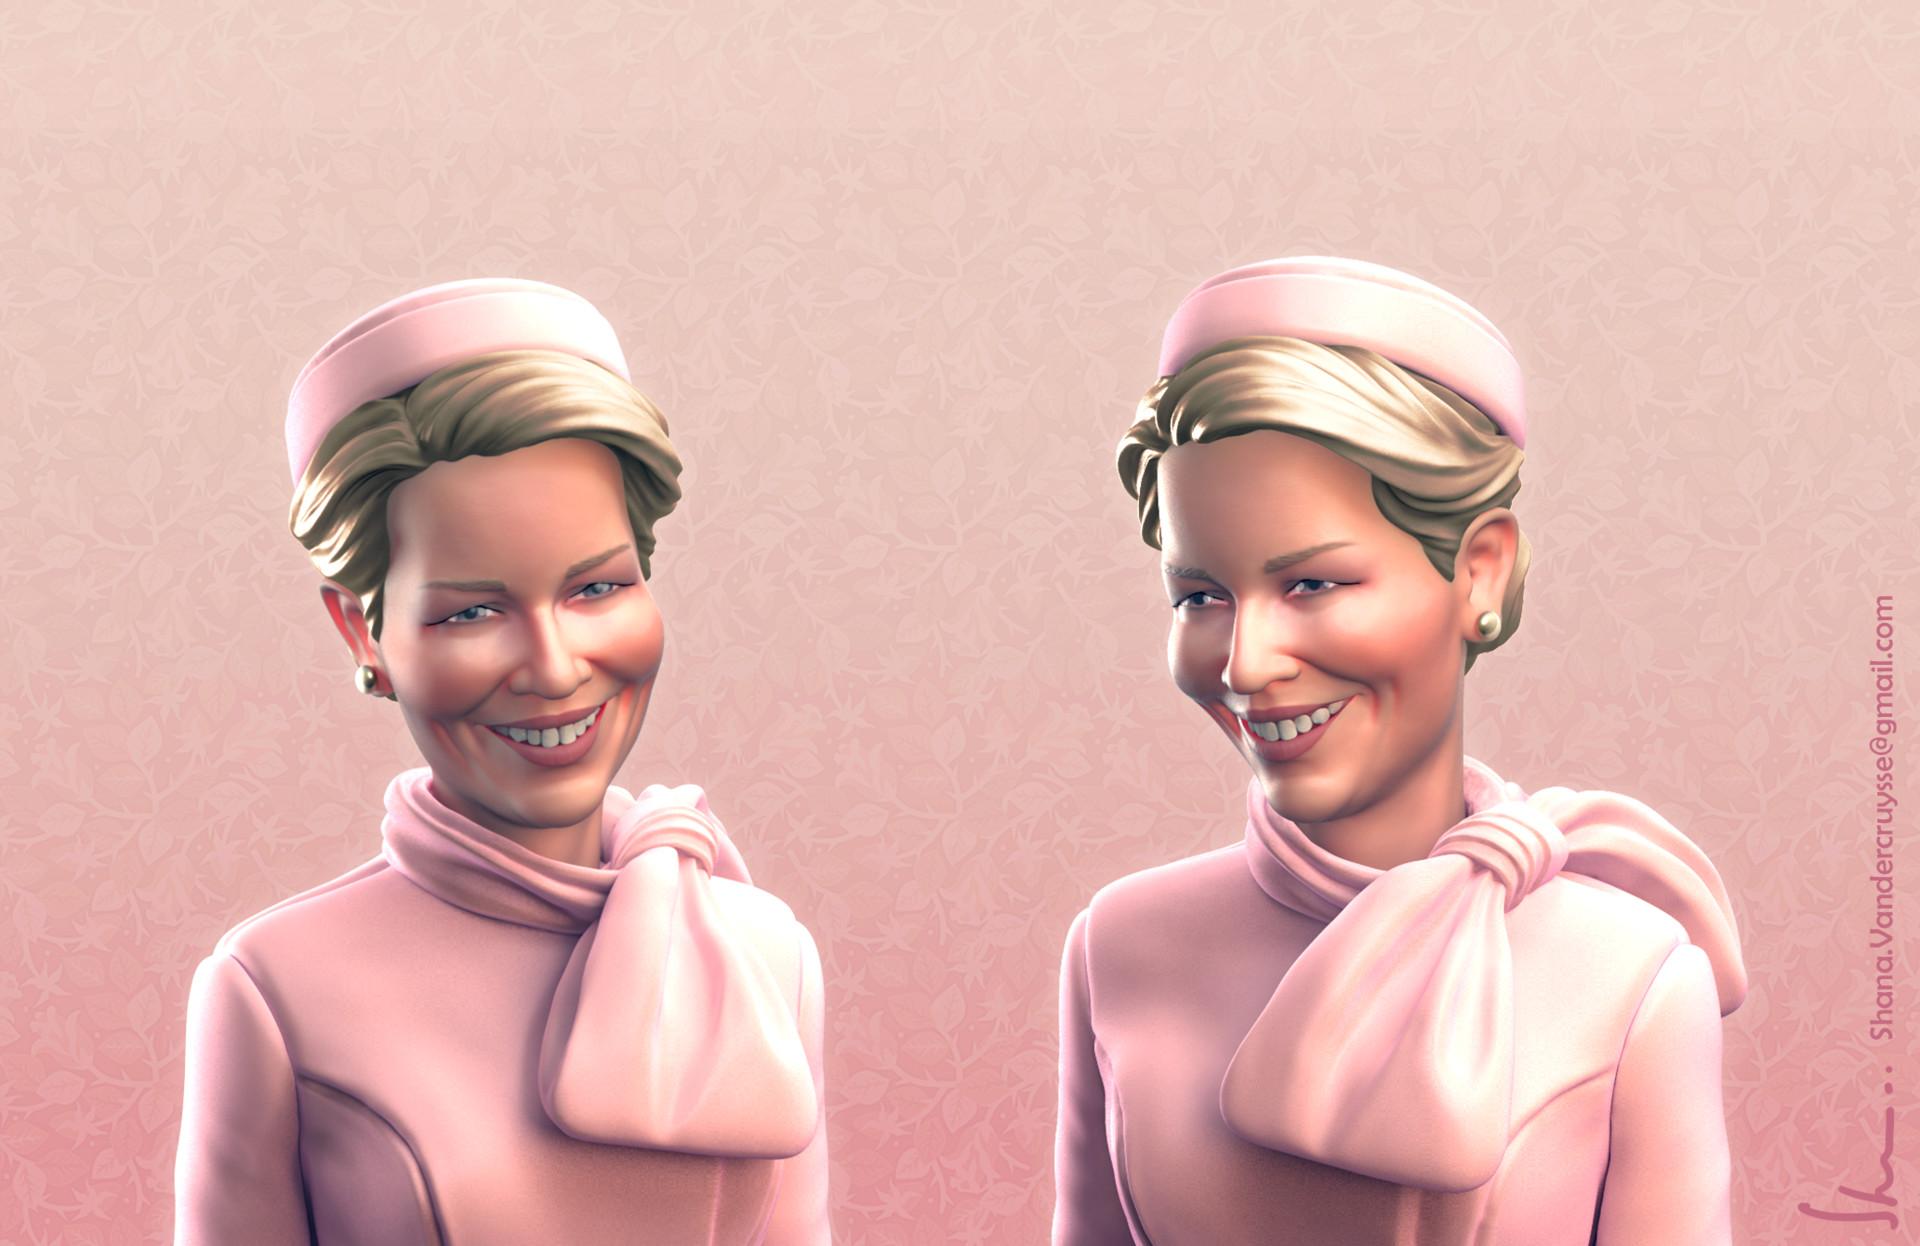 Shana vandercruysse mathilda closeup 03